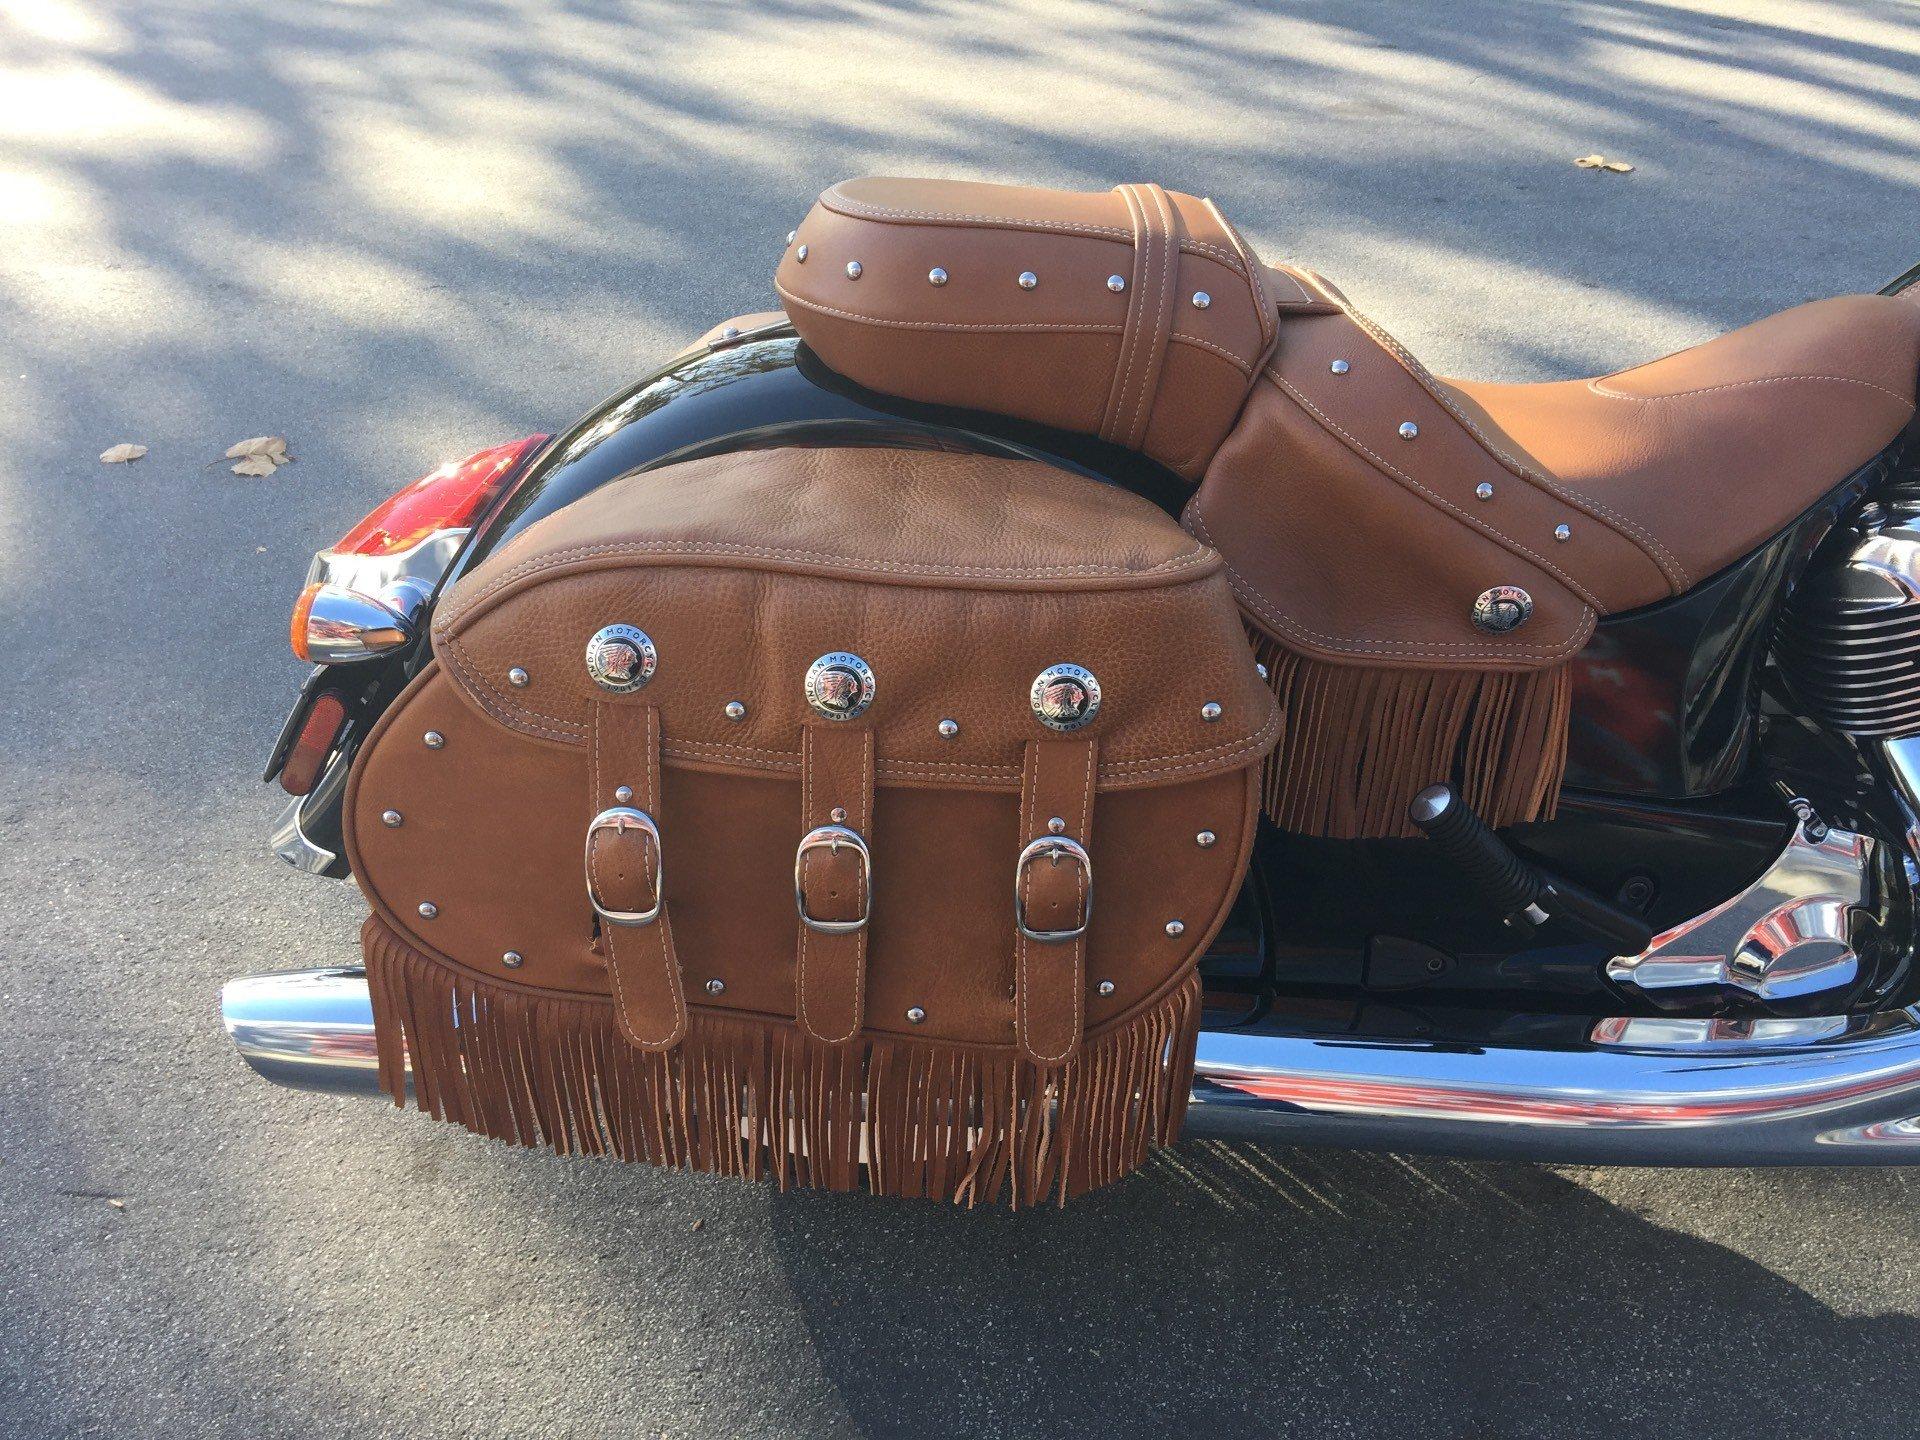 2017 Indian Chief® Vintage in San Jose, California